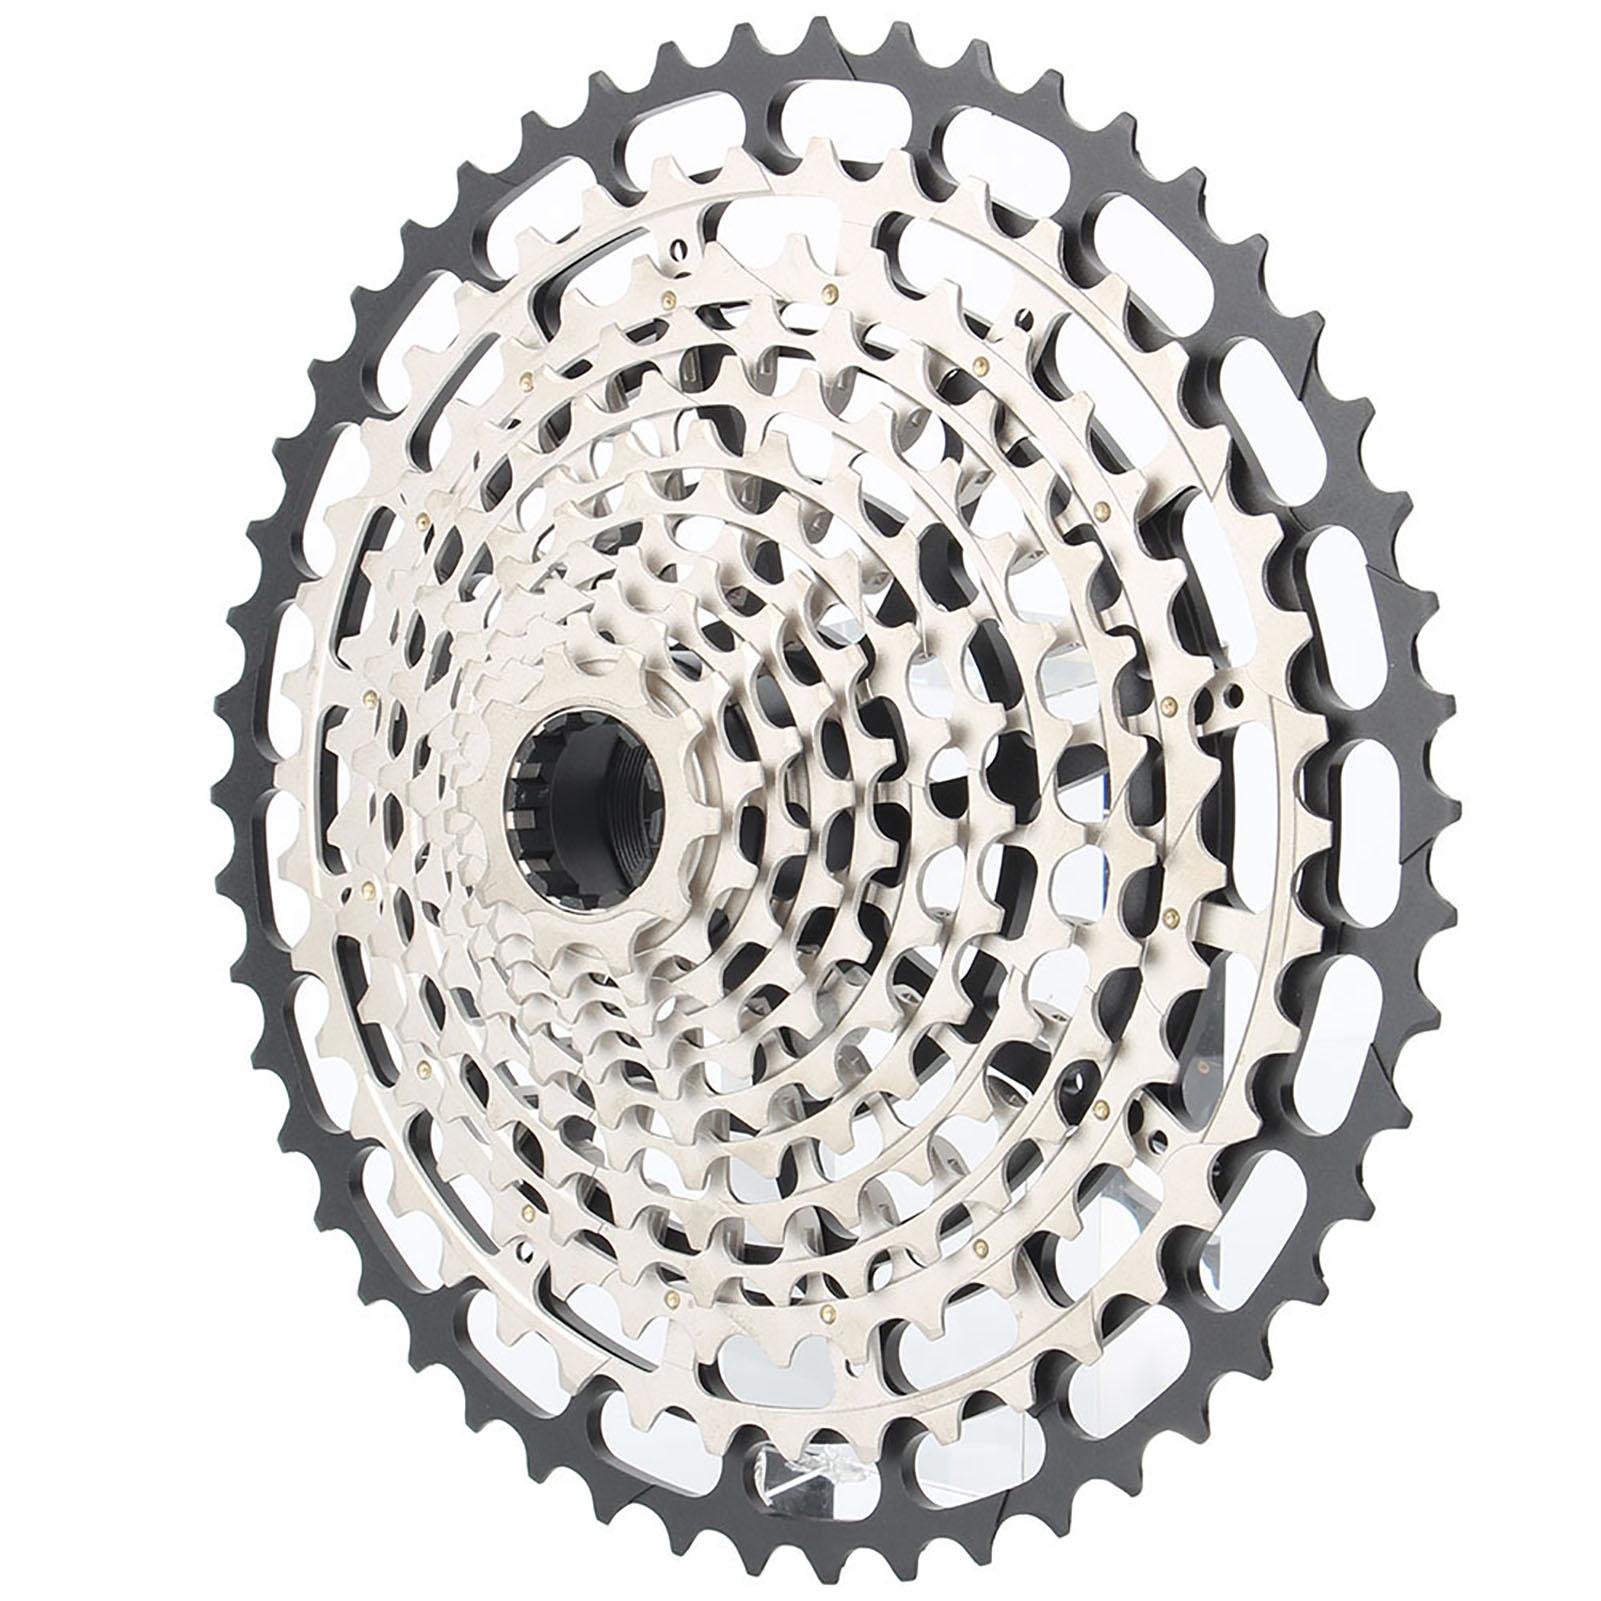 ZTTO-12-Speed-Cassette-10-50T-11-50T-Freewheel-Mountain-Bike-Sprocket-Compatible thumbnail 12